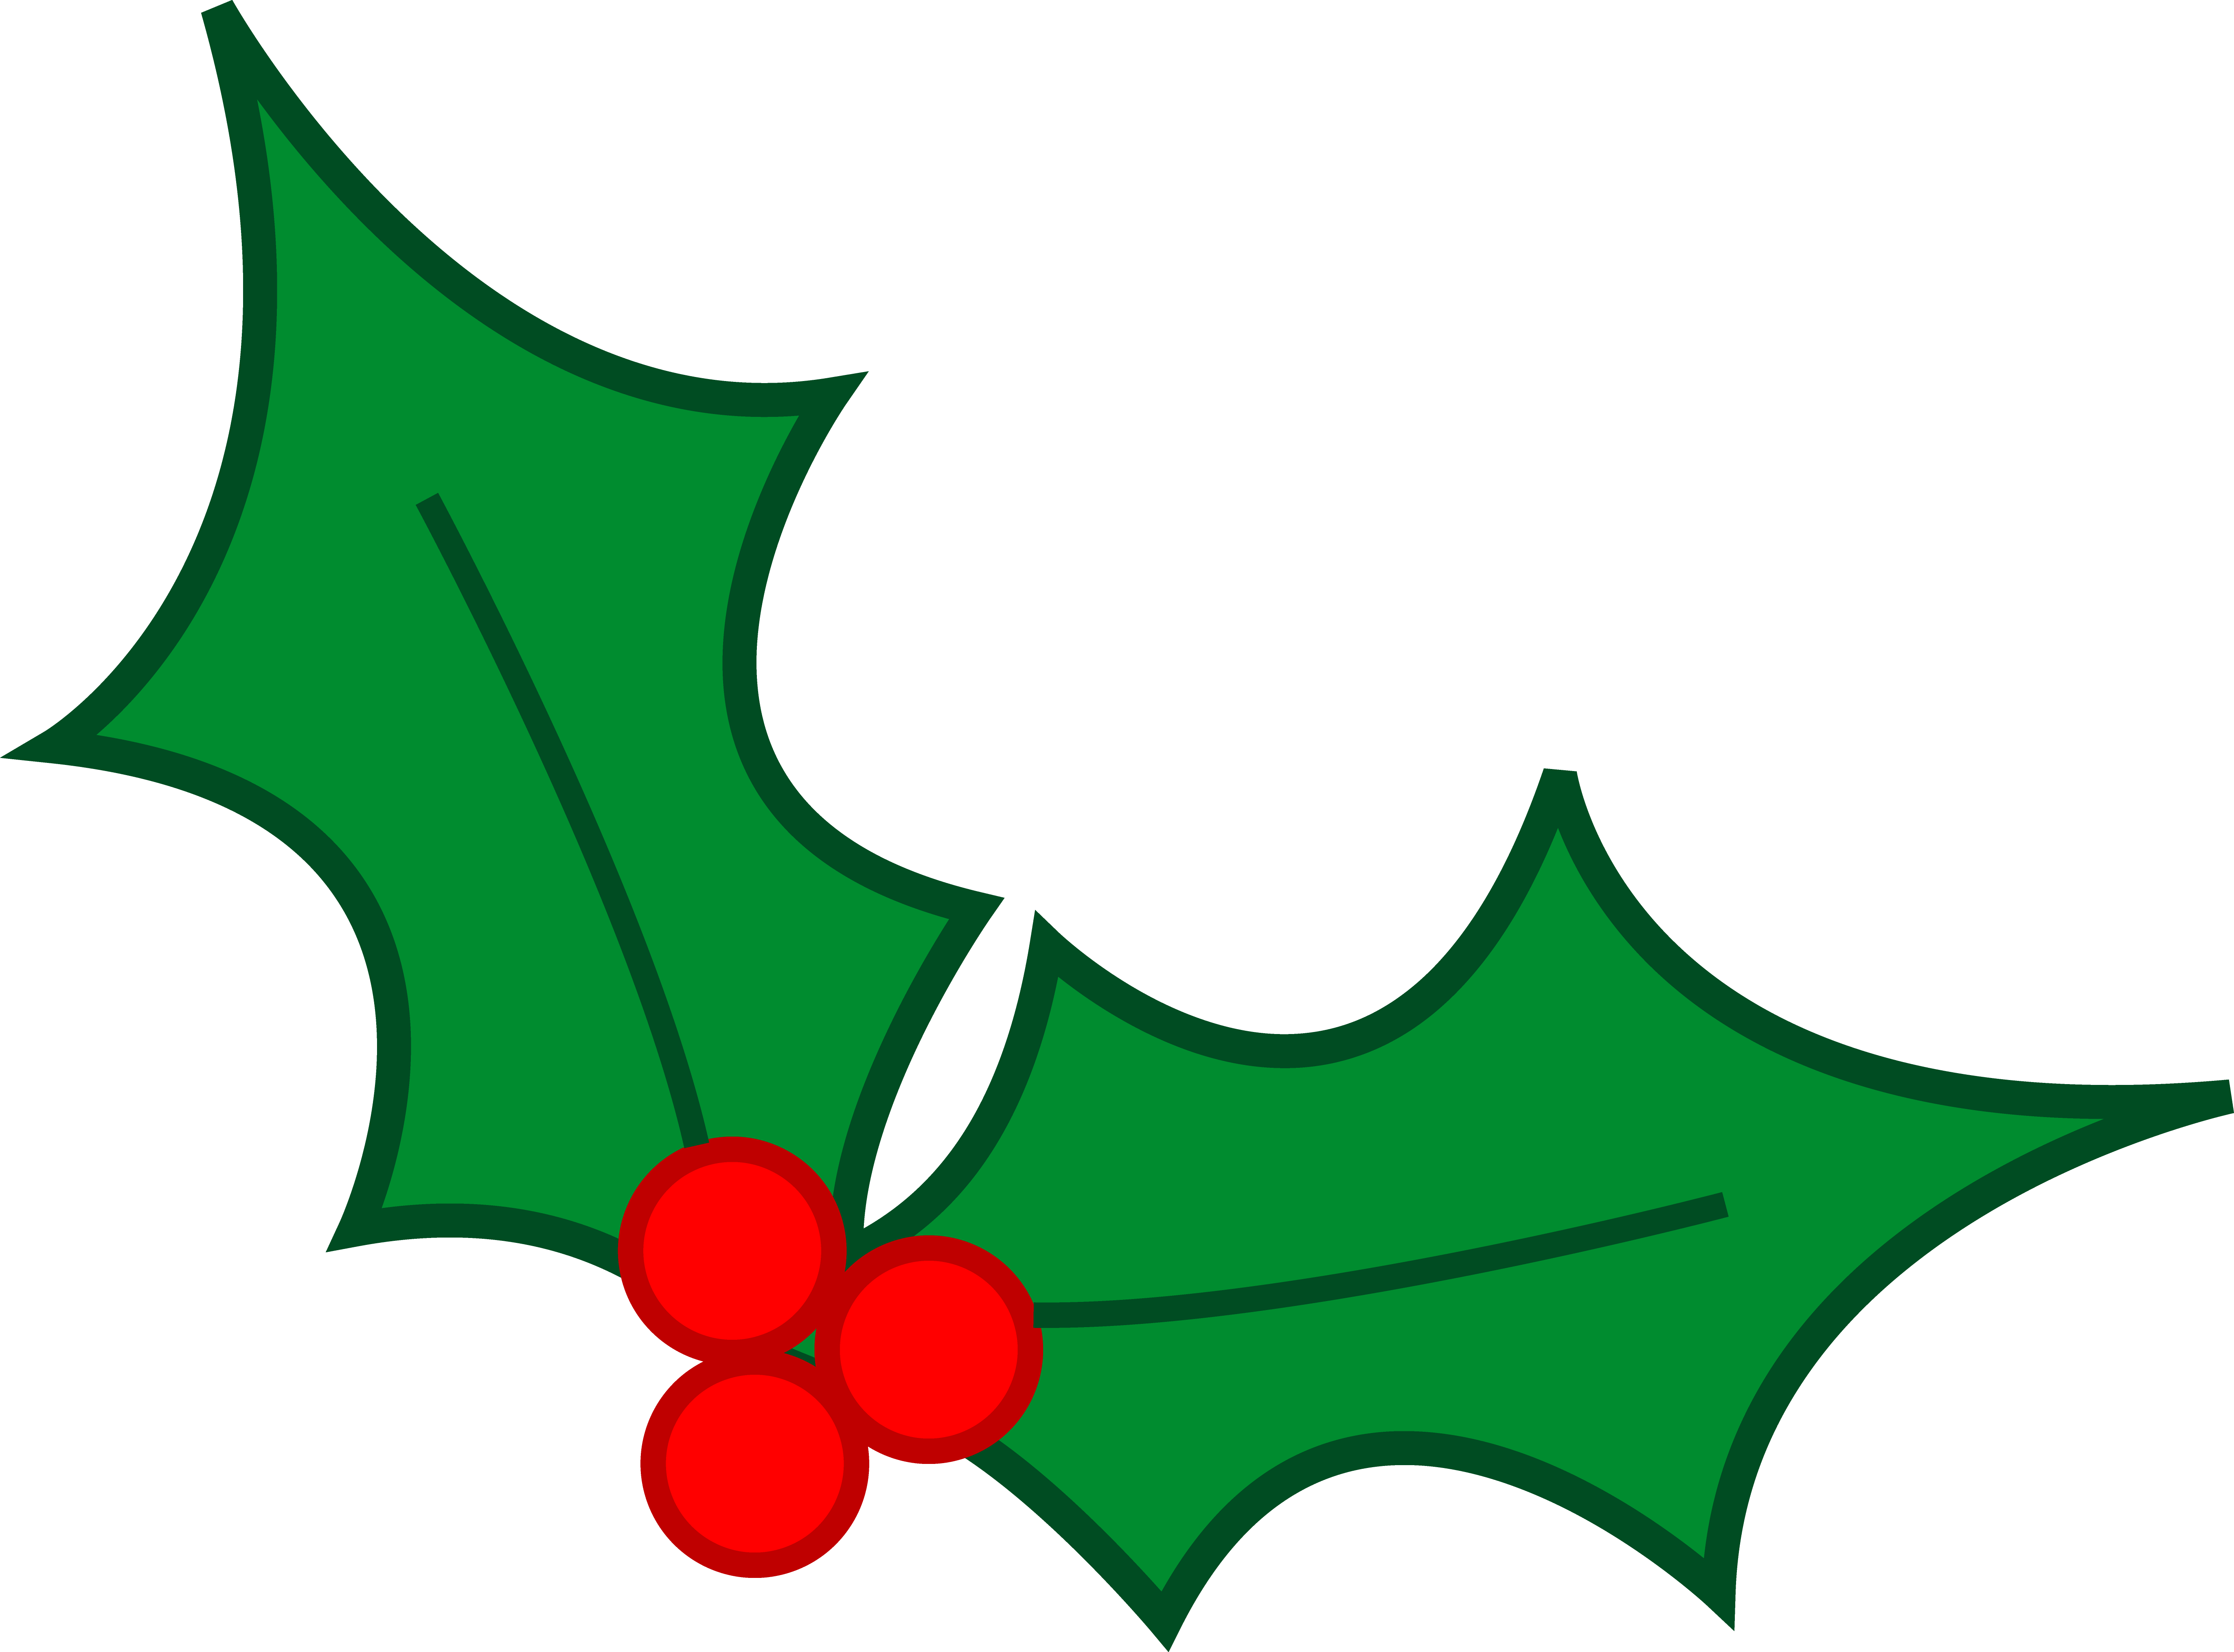 5487x4058 Christmas Art Clips